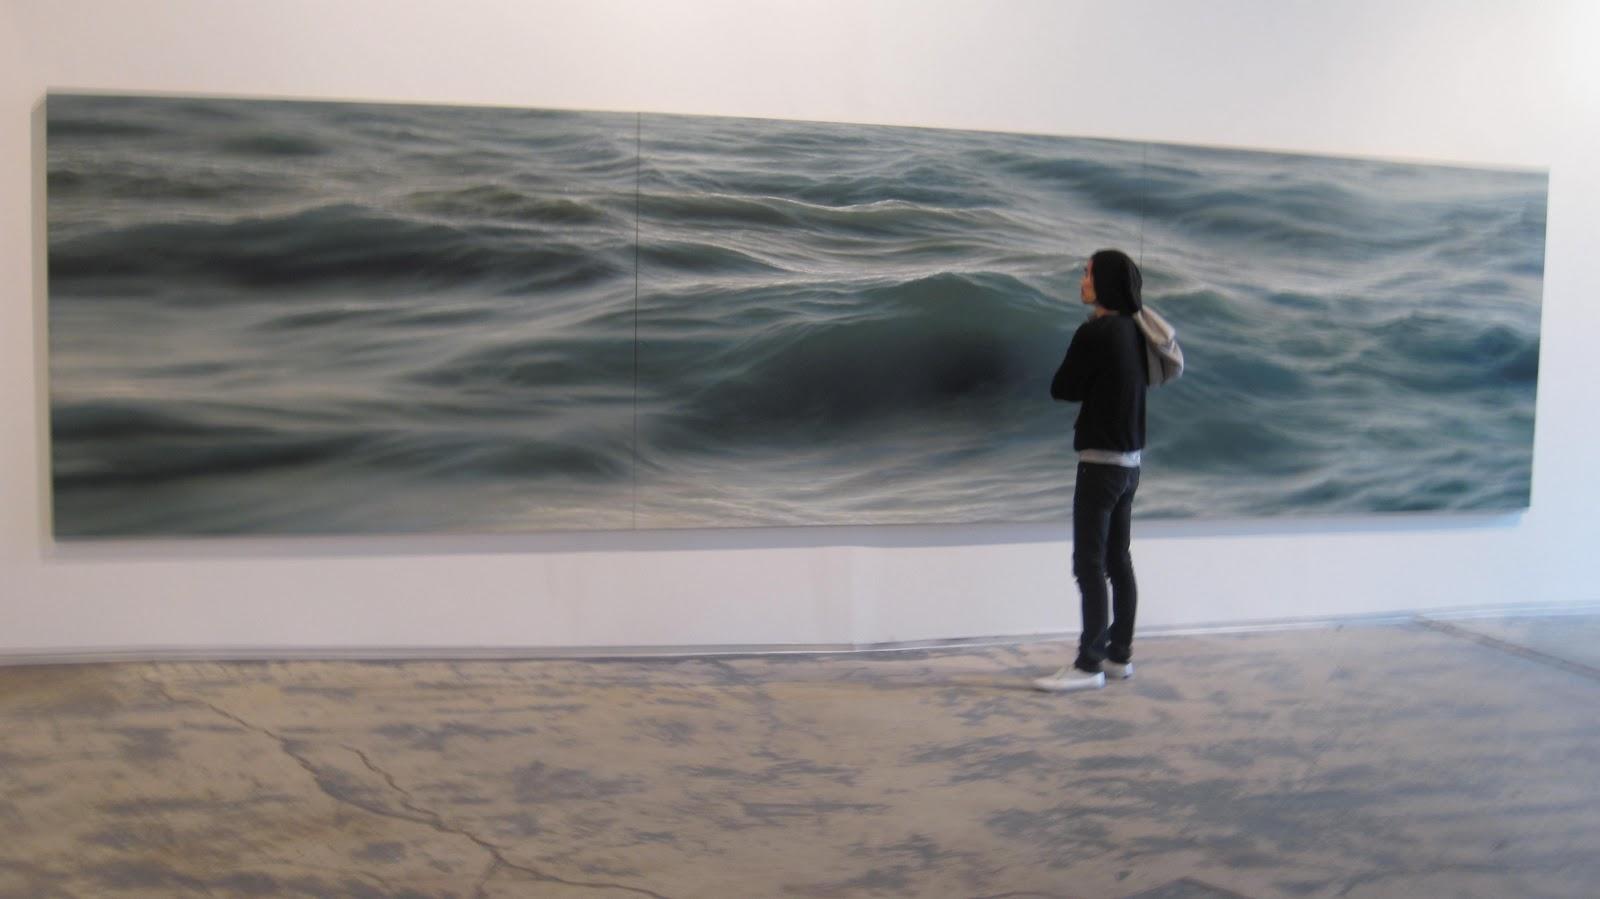 Eccezionale OperArt [work 99] – Dipinto (di mare) di Ran Ortner (Stati Uniti  FE16